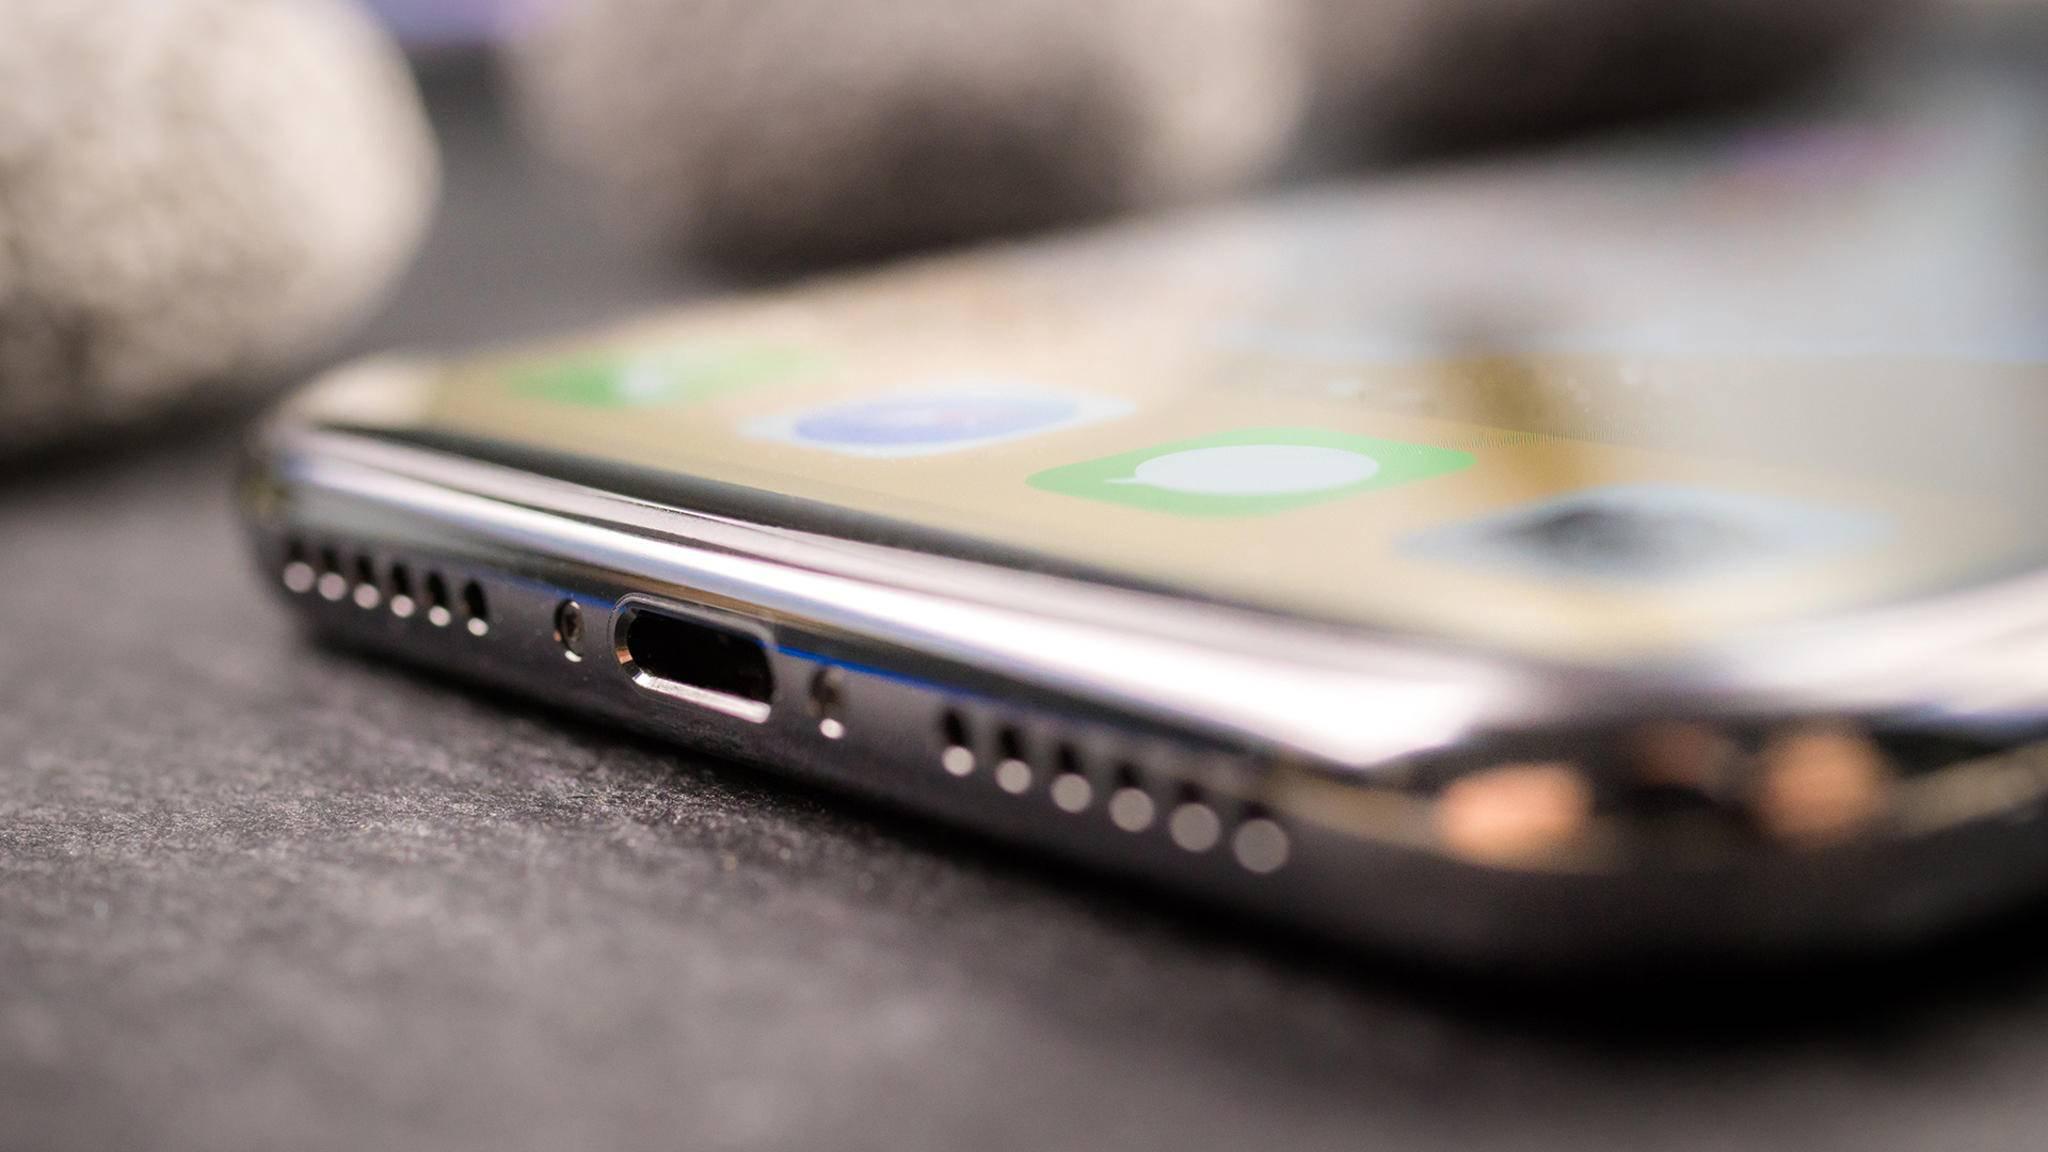 Seit dem iPhone 7 verzichten Apple-Smartphones auf den Standard-Kopfhöreranschluss.